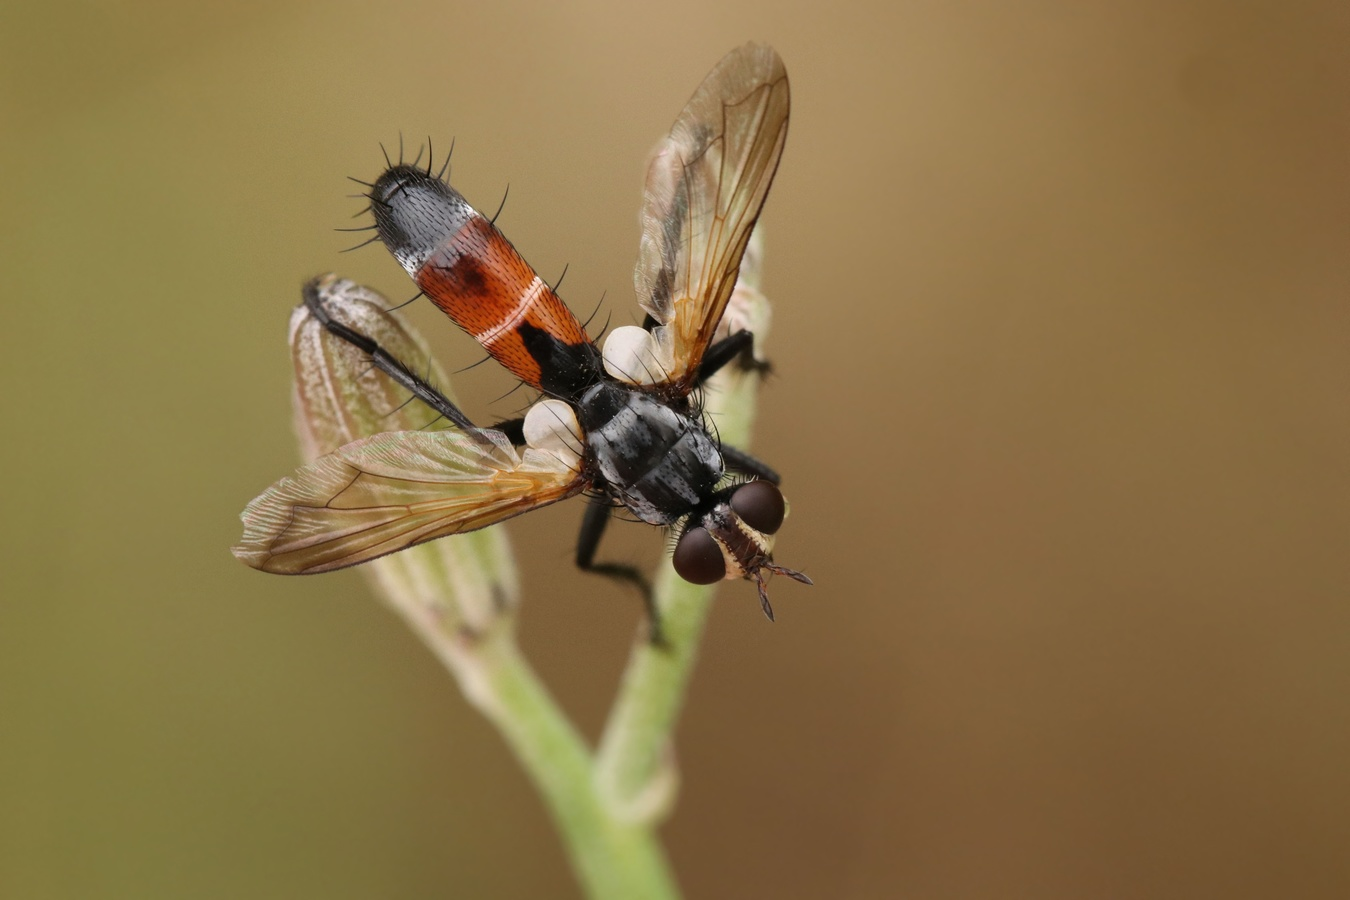 Kuklice (Cylindromyia brassicaria)